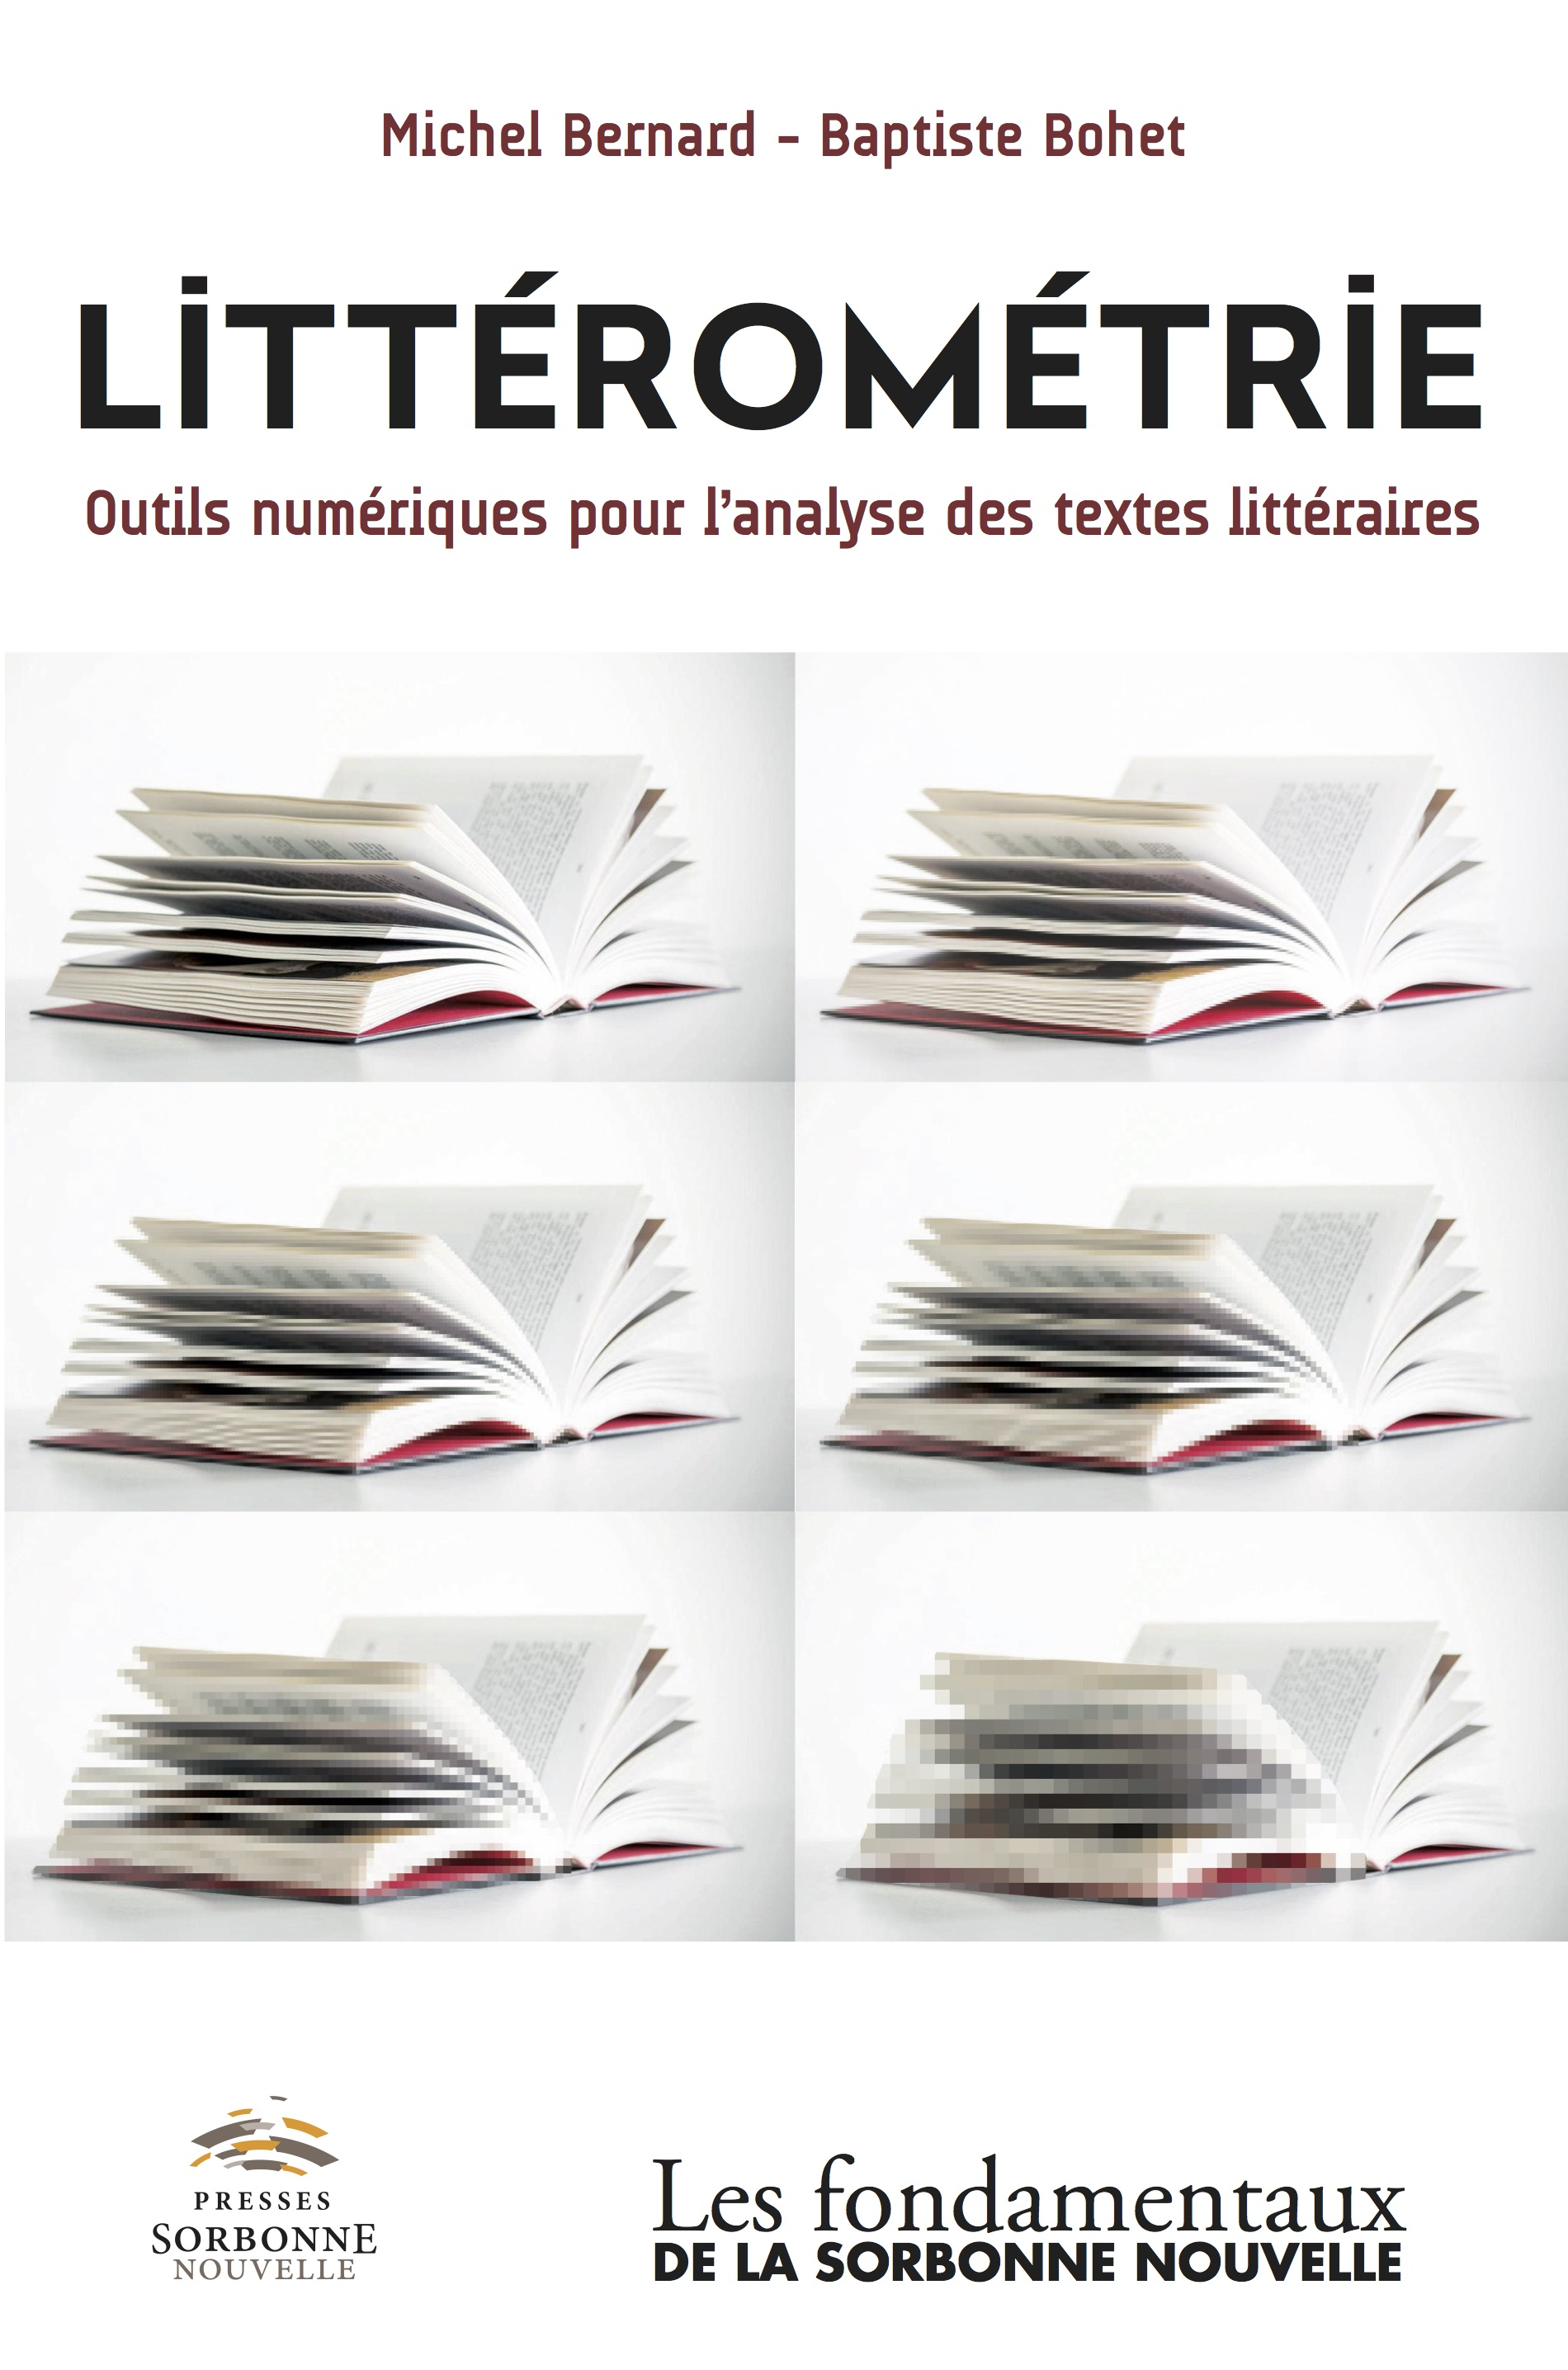 M. Bernard, B. Bohet, Littérométrie